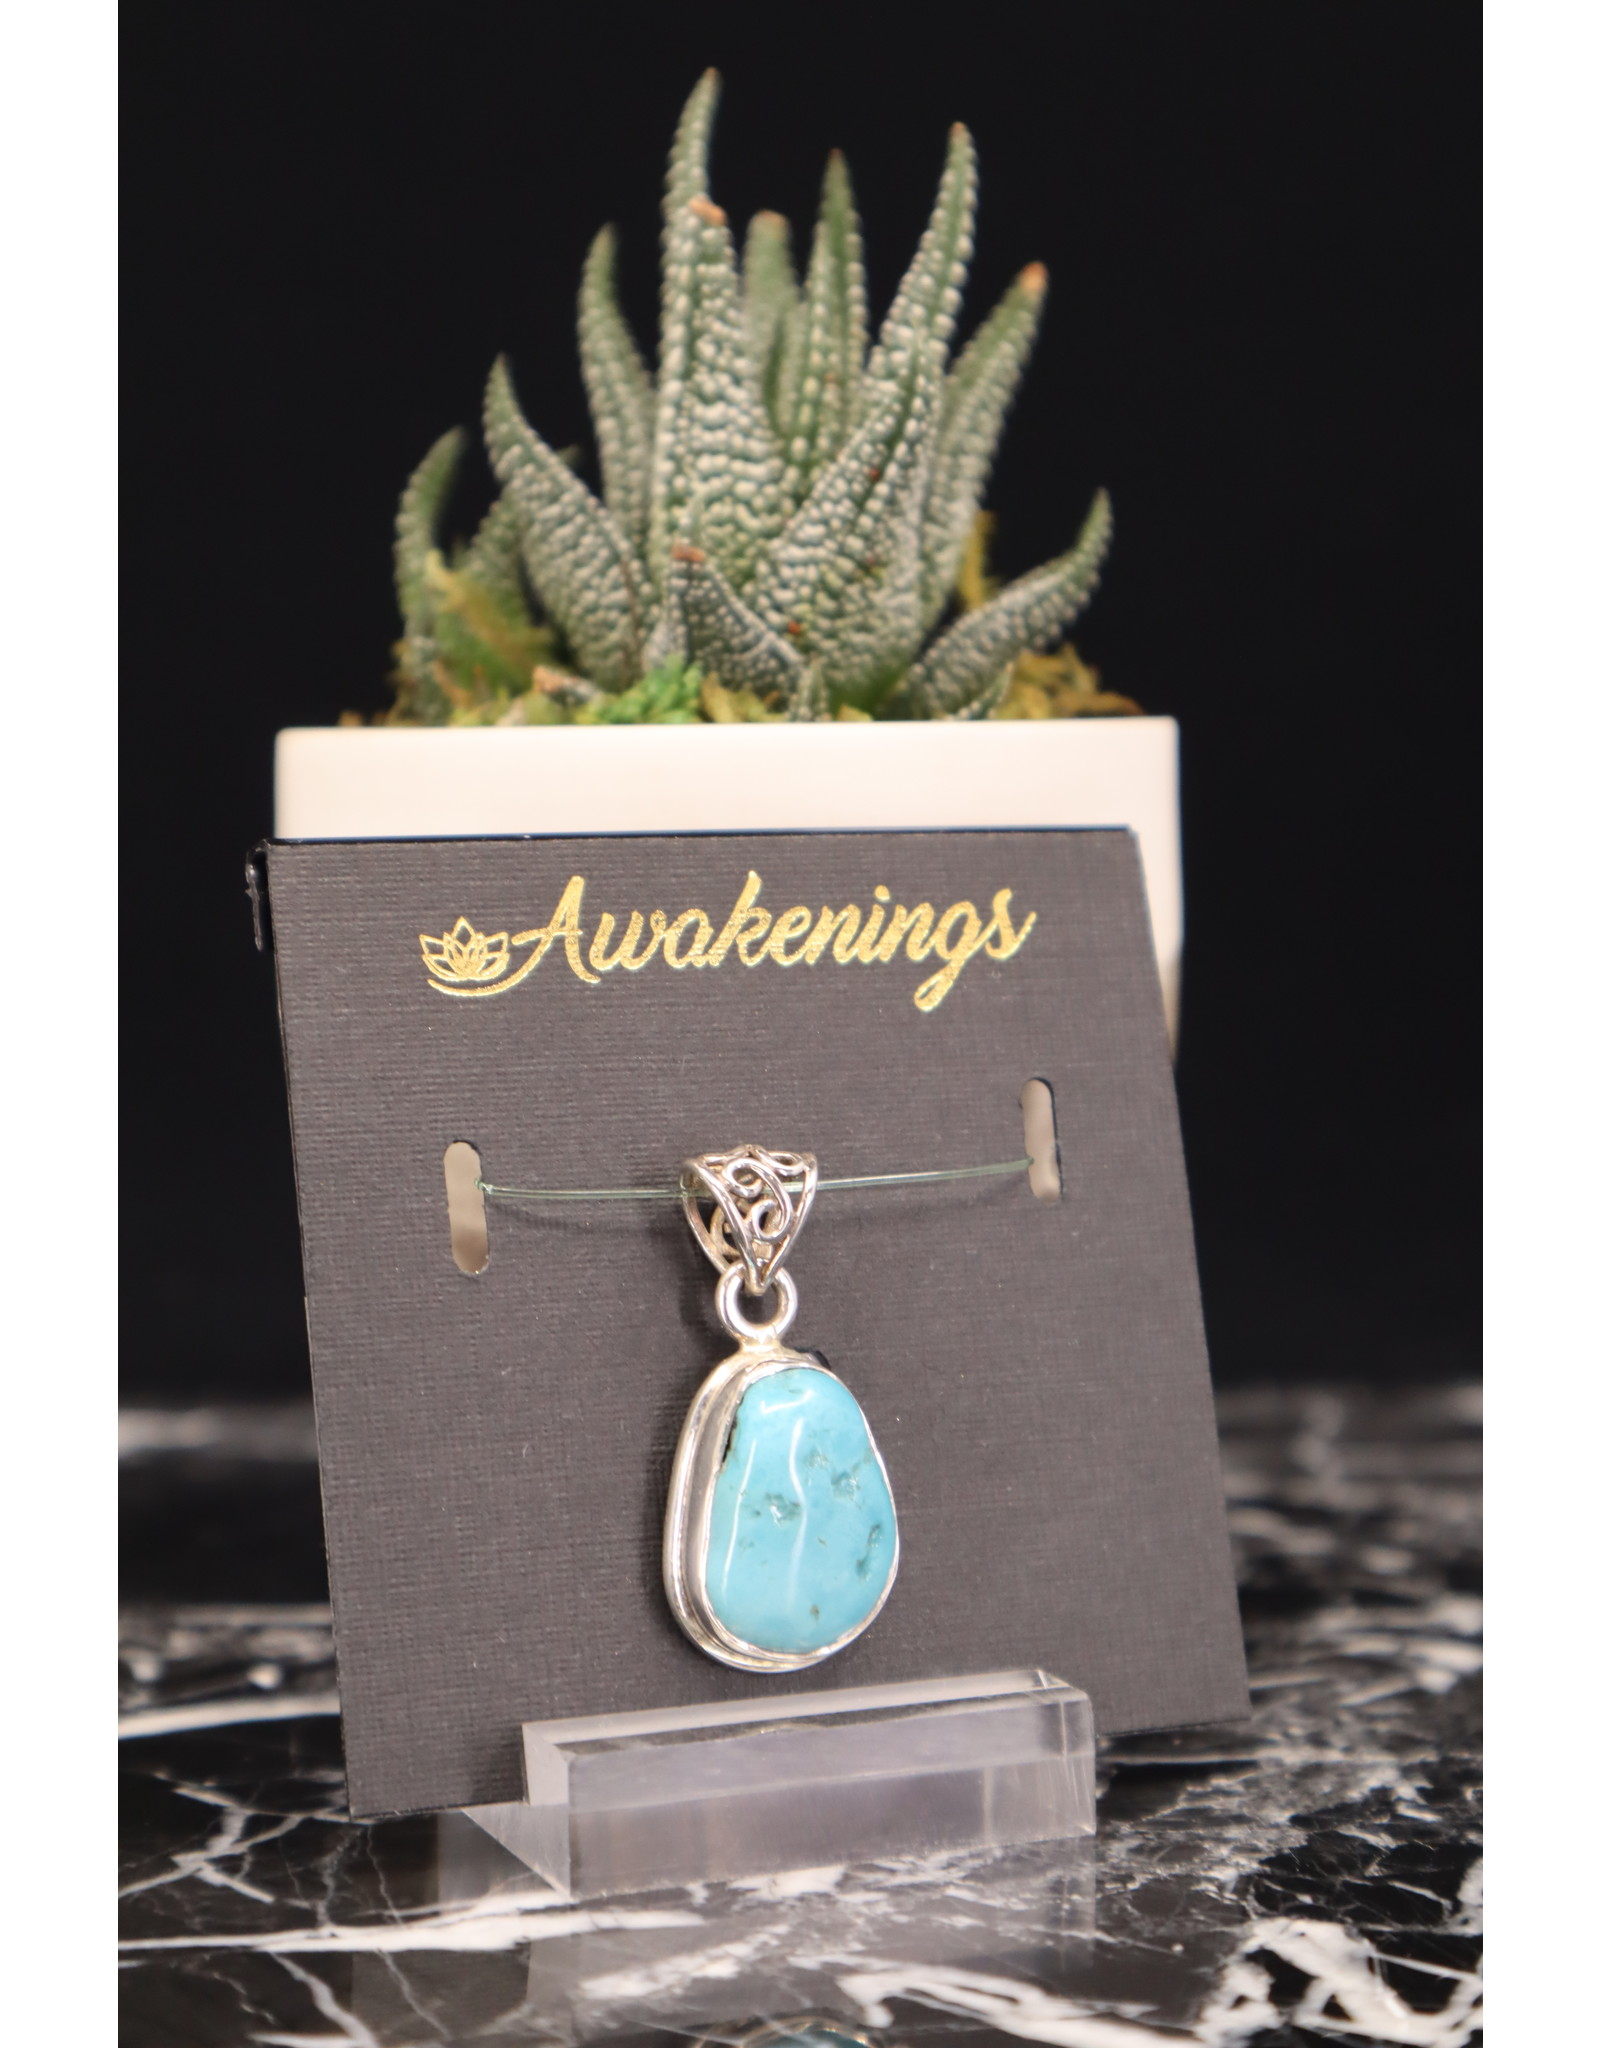 Arizona Turquoise Pendant #2